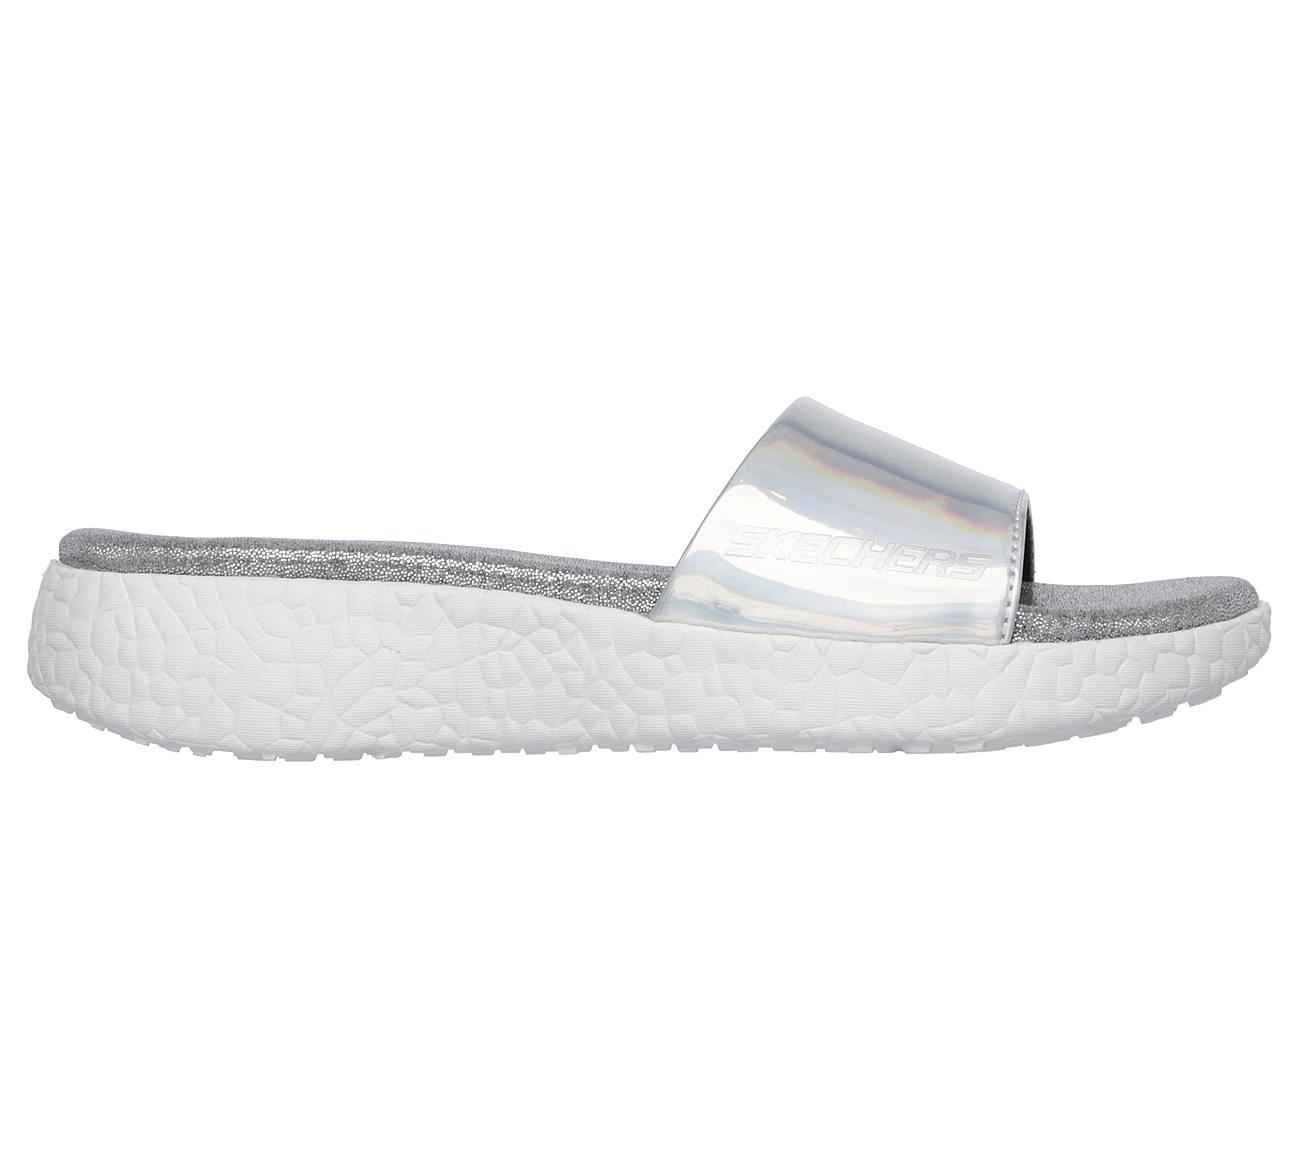 Skechers BURST - INTROSPECT